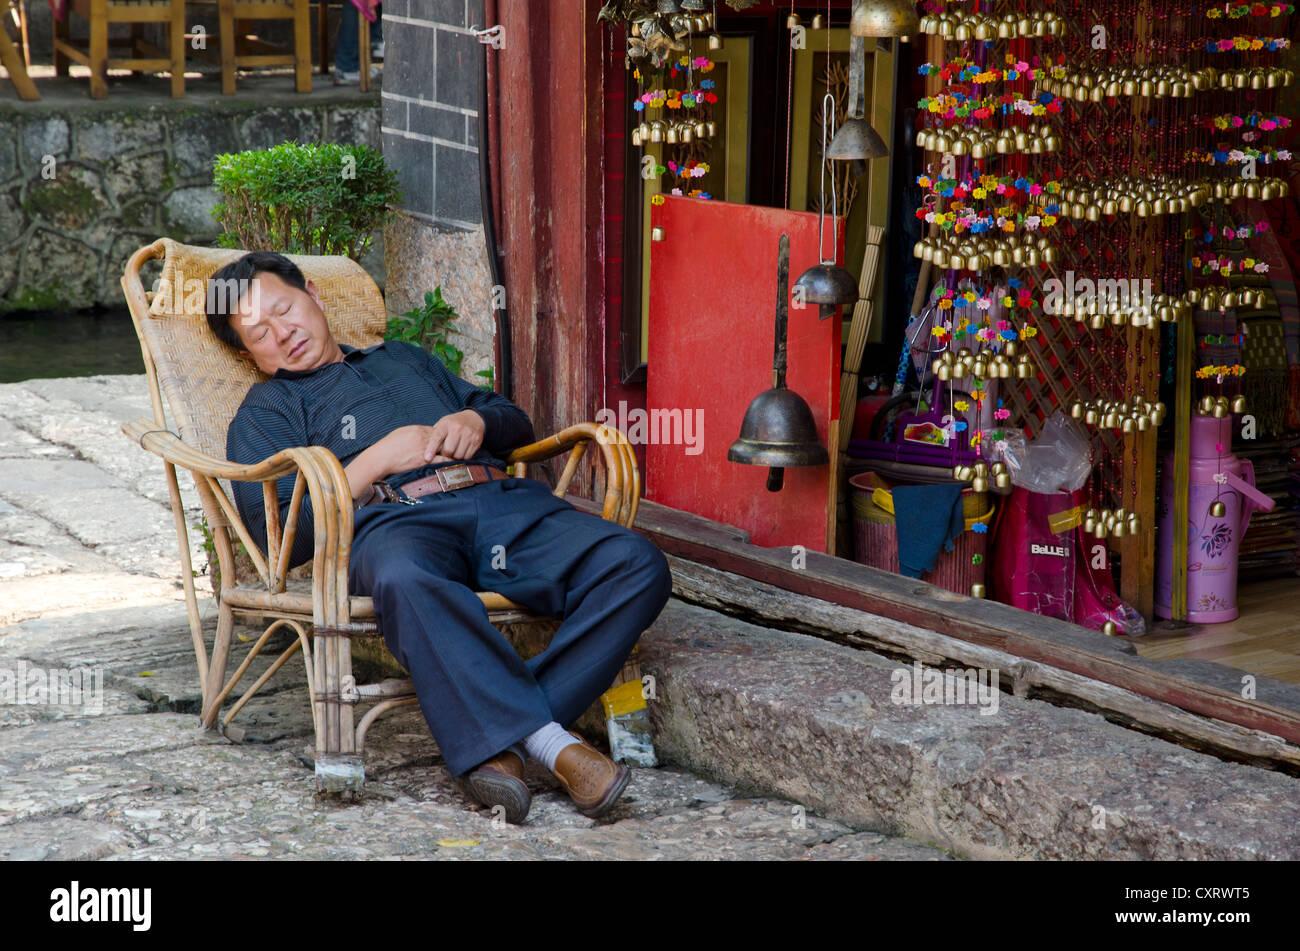 Shopkeeper asleep in front of his shop, Lijiang, Yunnan, southeast China, China, Asia - Stock Image